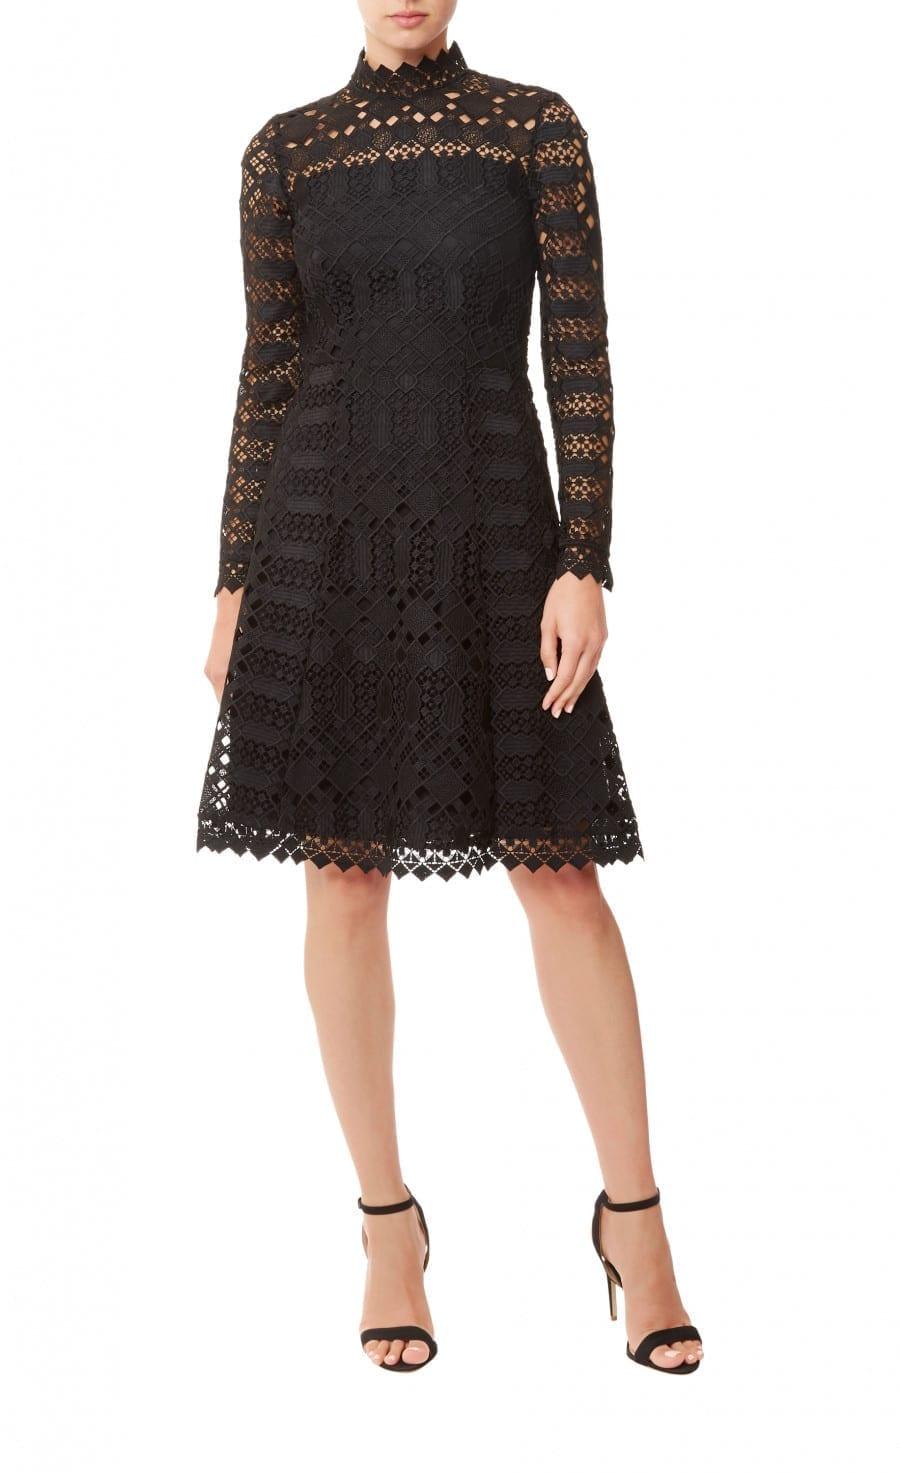 TEMPERLEY LONDON Amelia Lace Black Dress